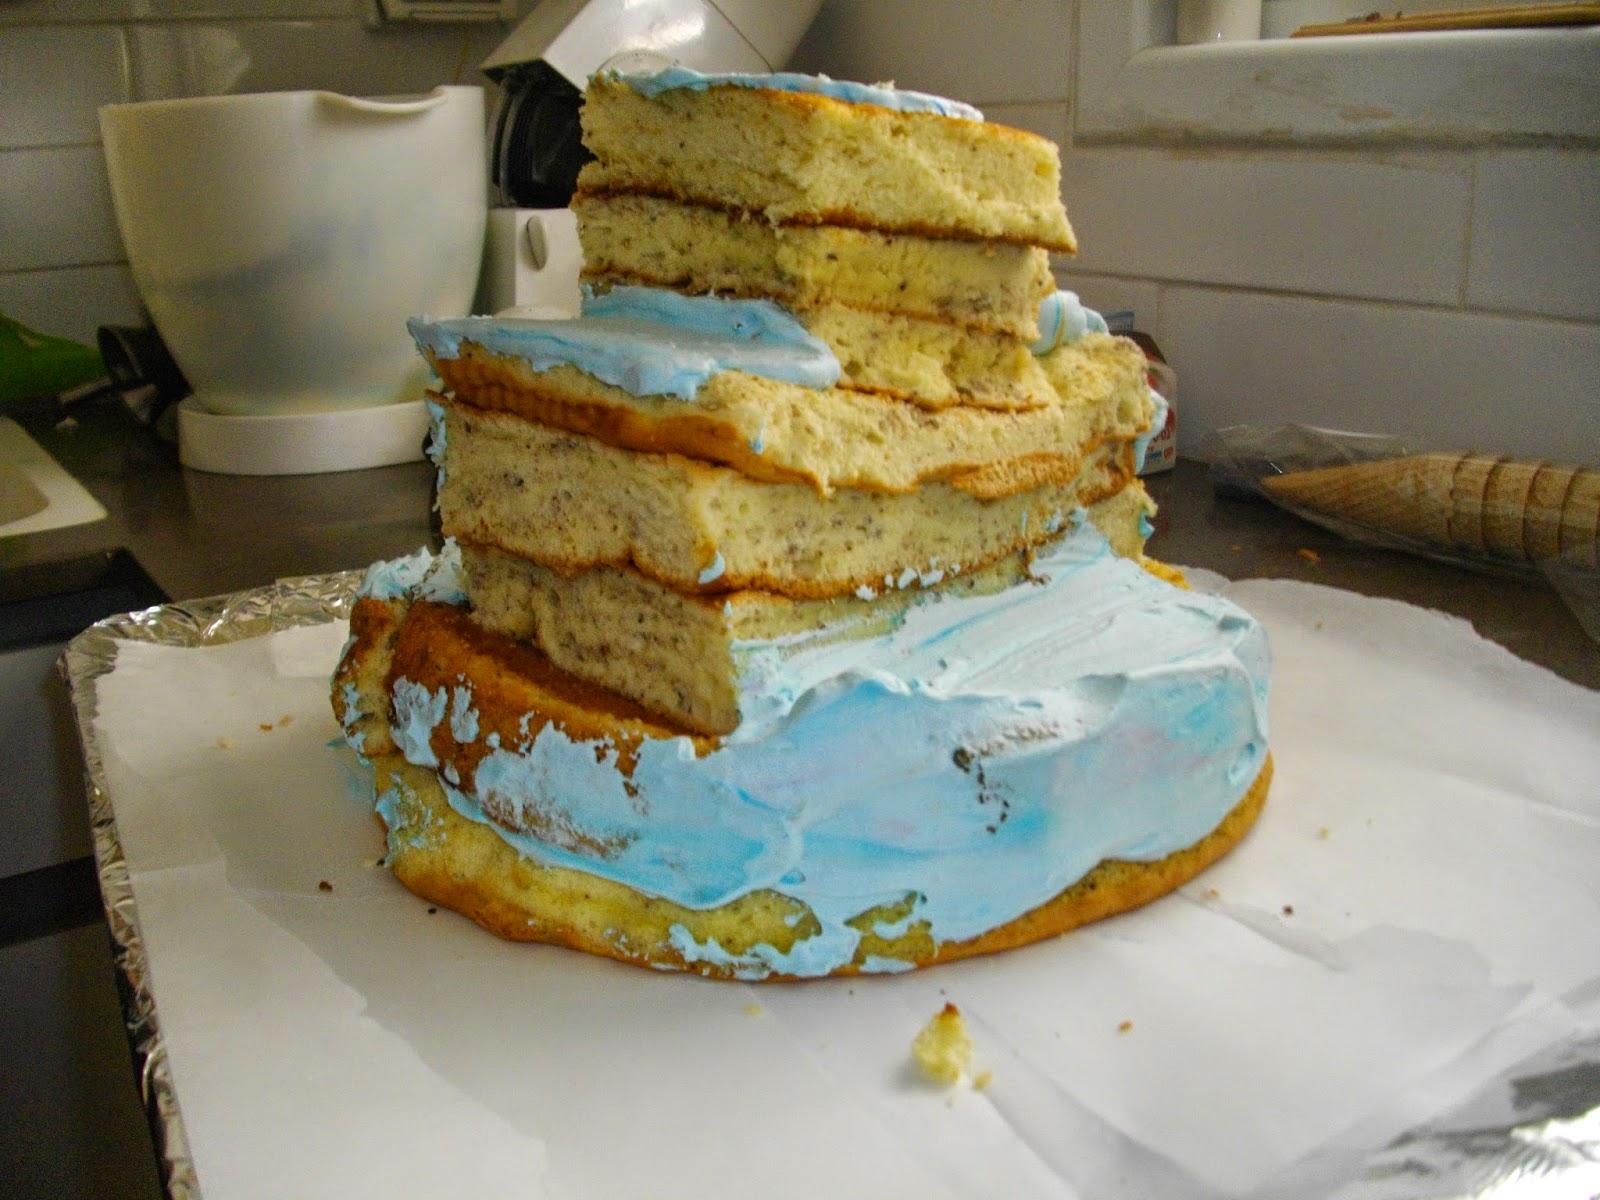 IMGP2861 - עוגת יומולדת בצורת ארמון